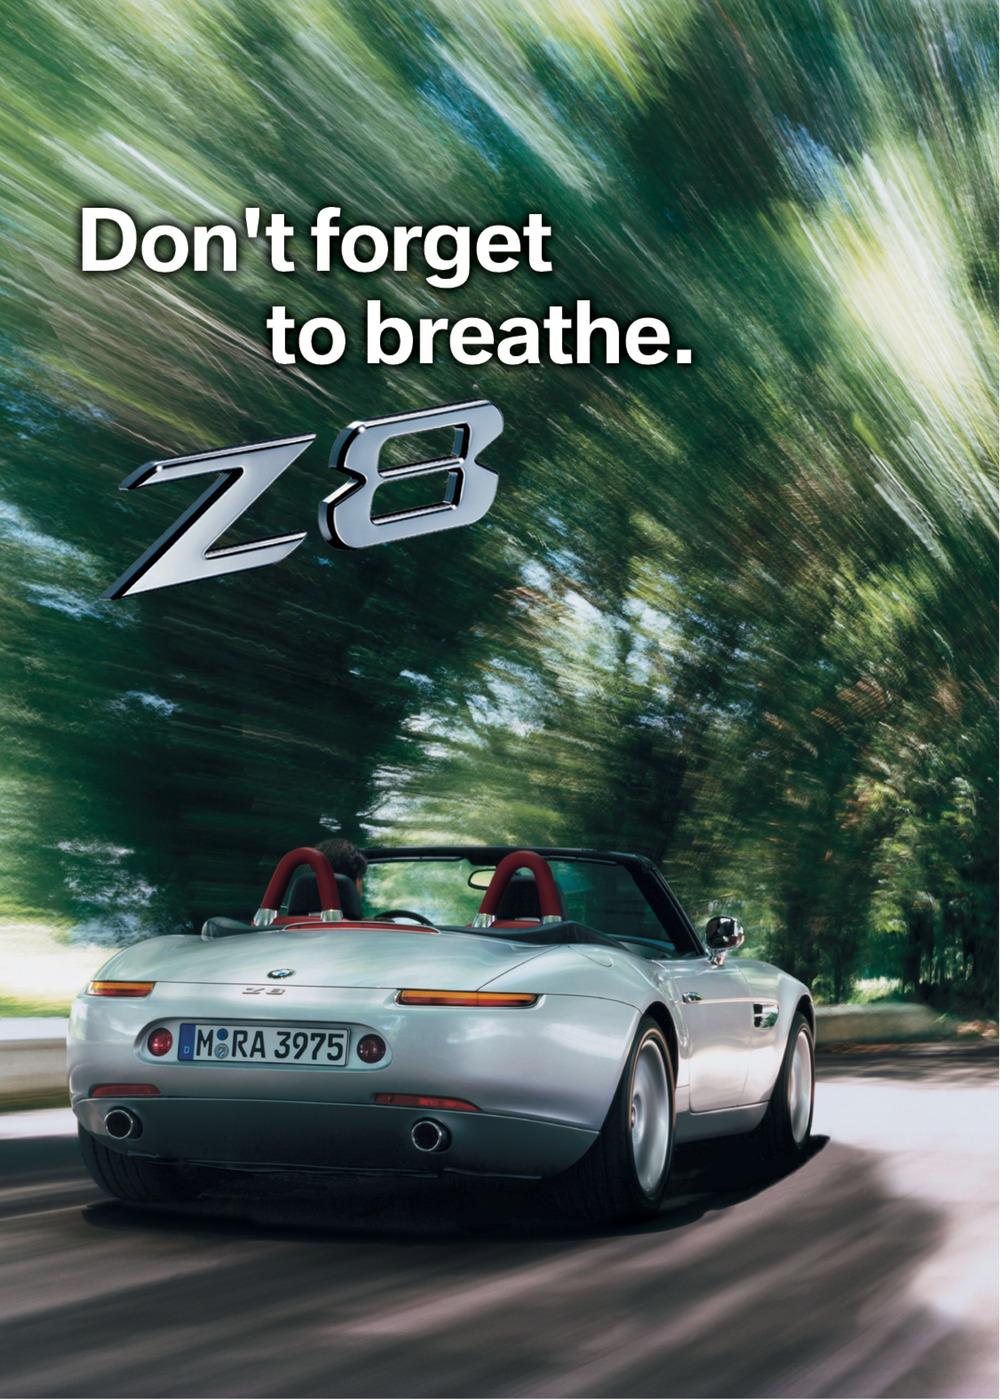 BMW Z8 Poster